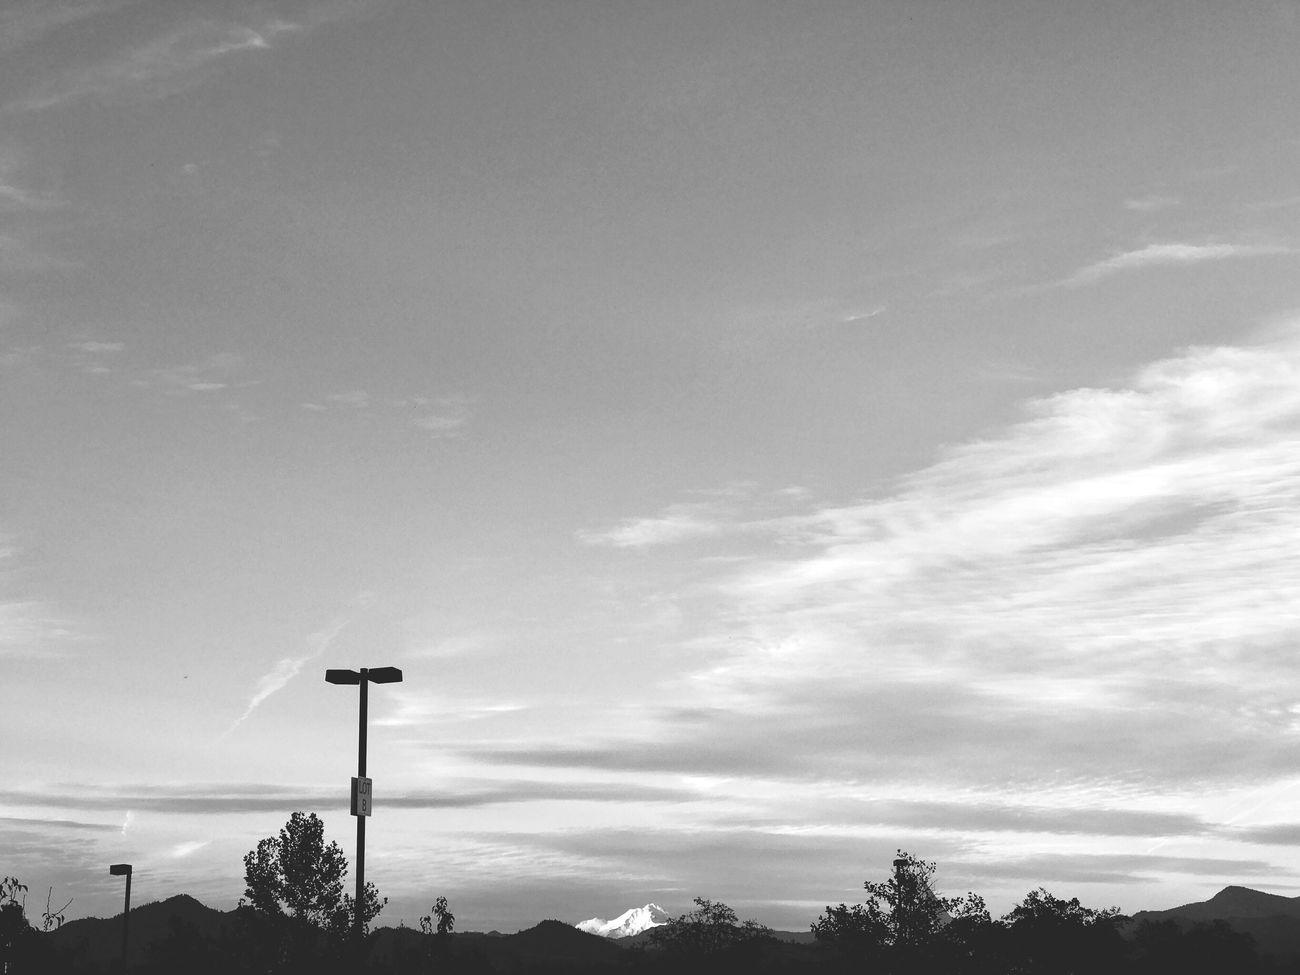 Eyes on the prize. Sky Outdoors Mountain Mount Shasta